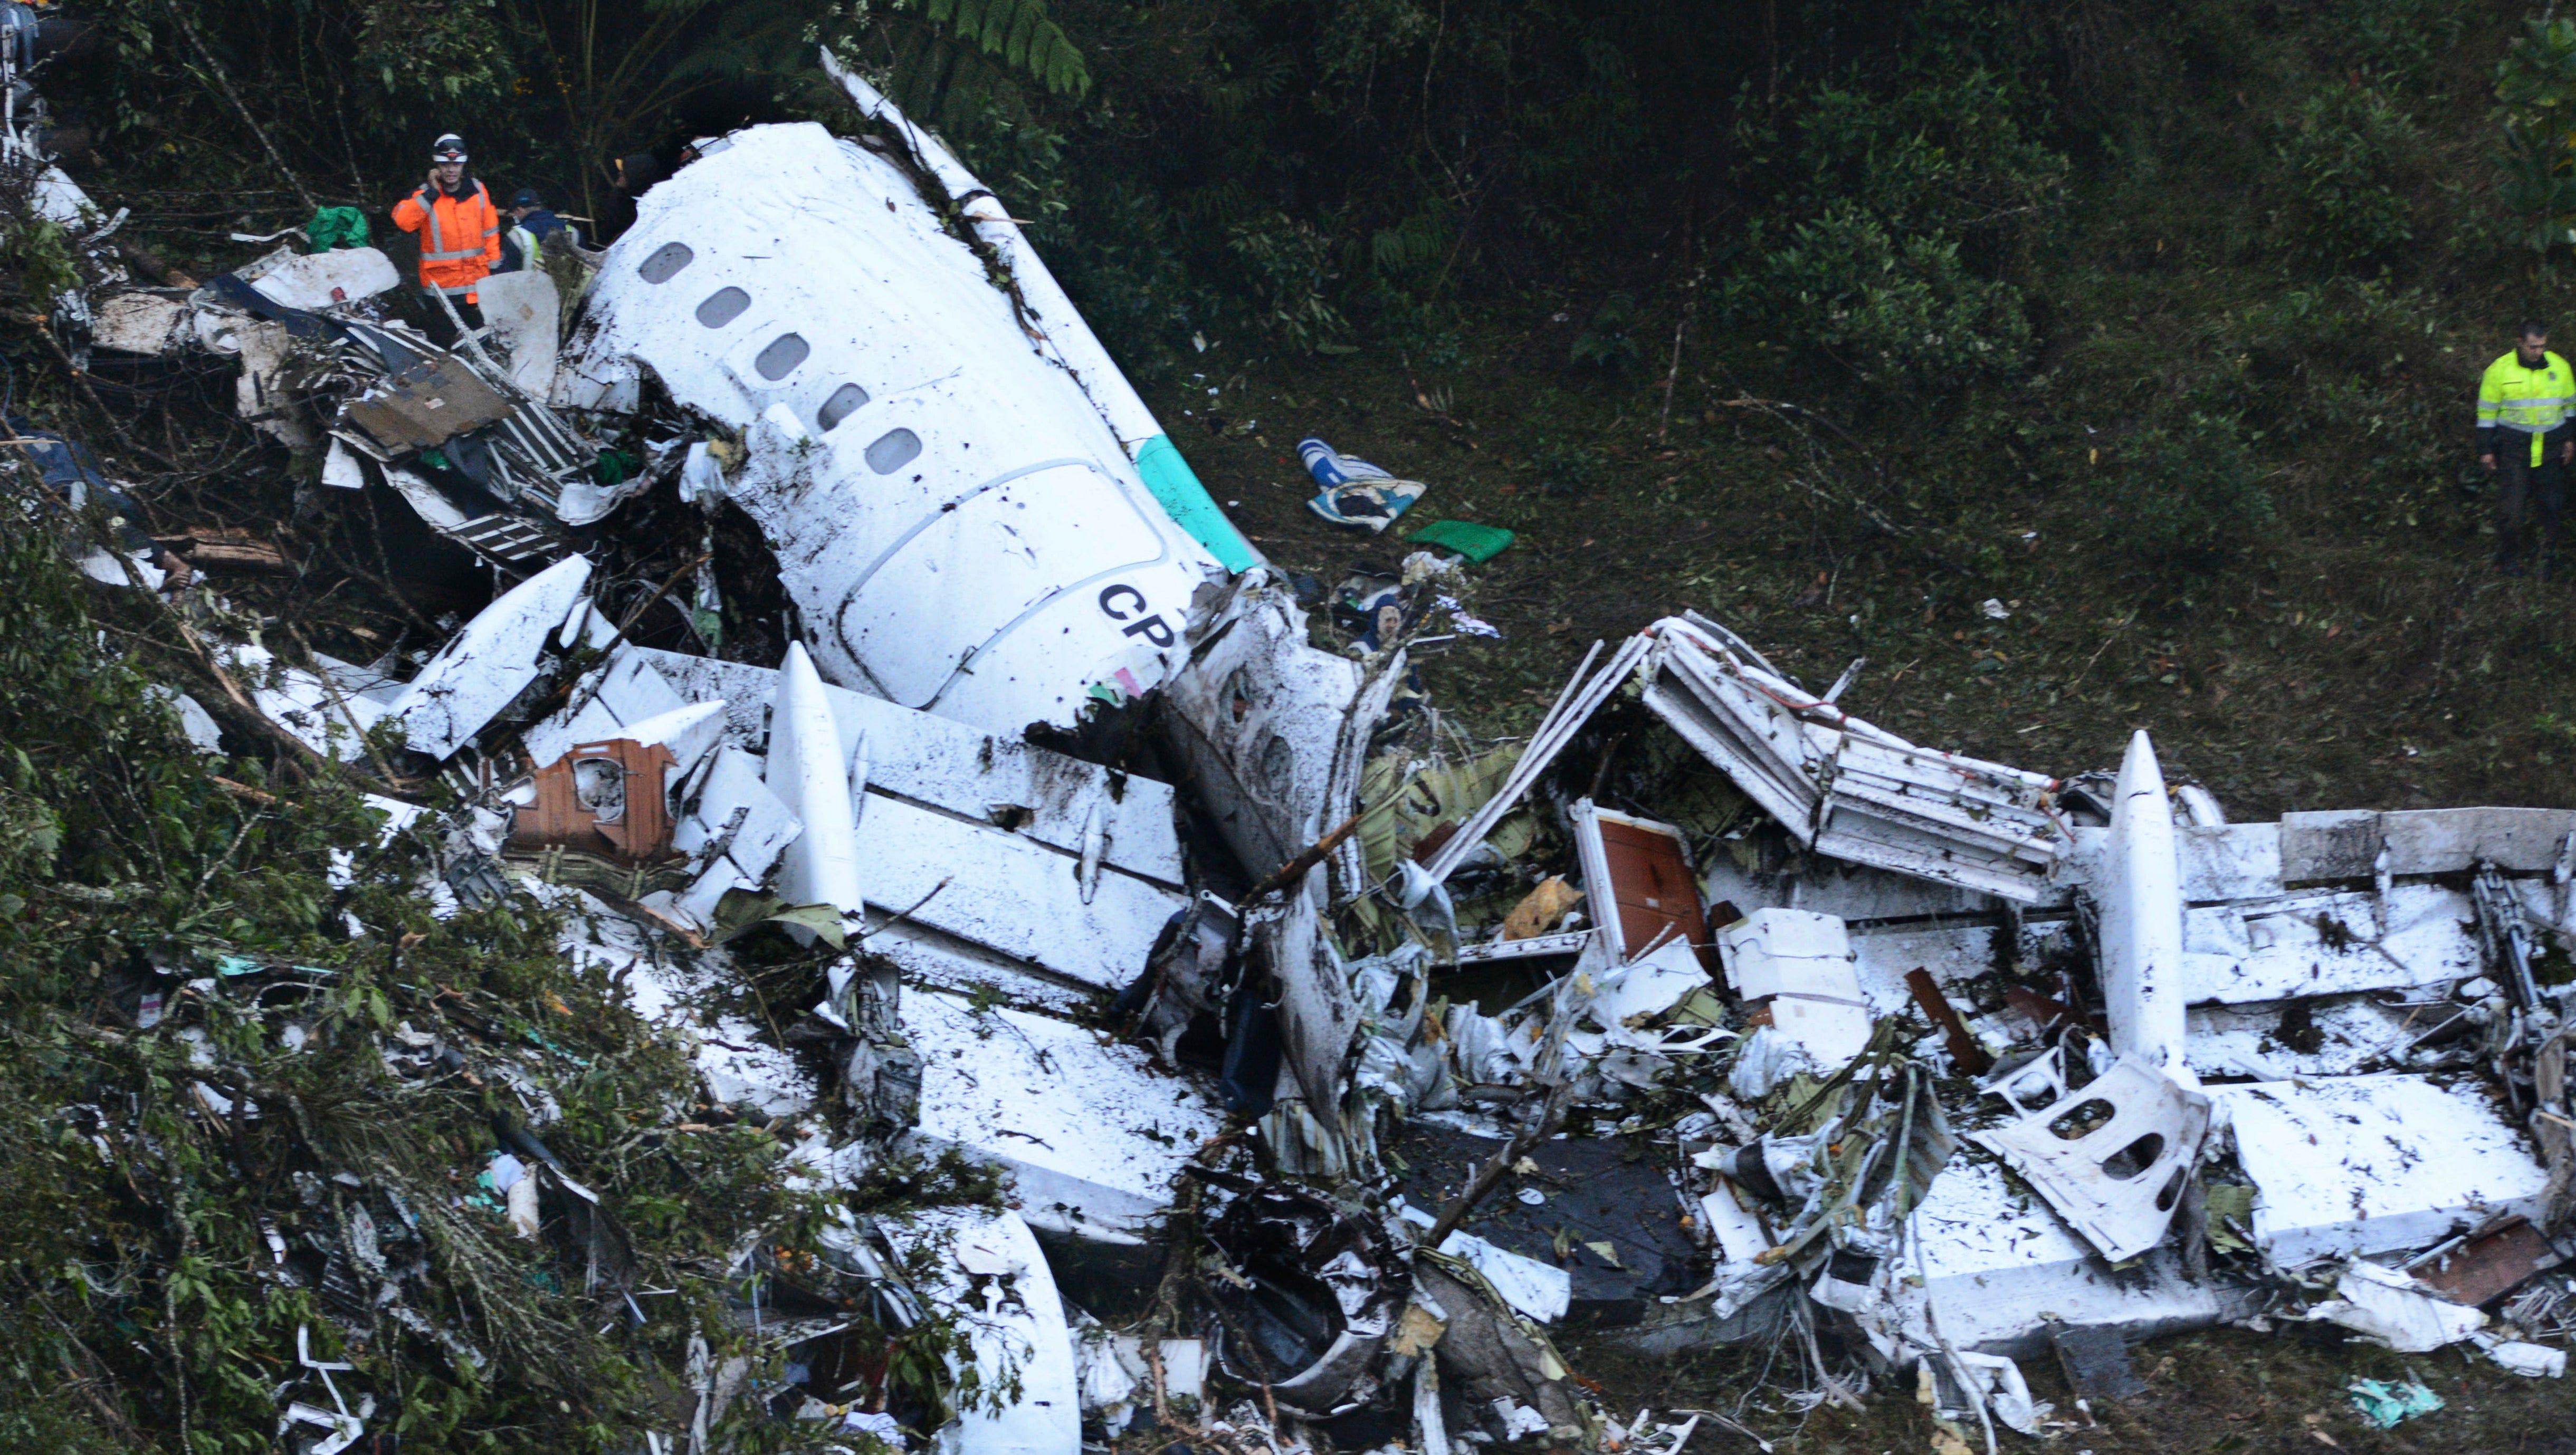 Brazil Soccer Team Plane Crash Timeline Of Other Sports Related Tragedies